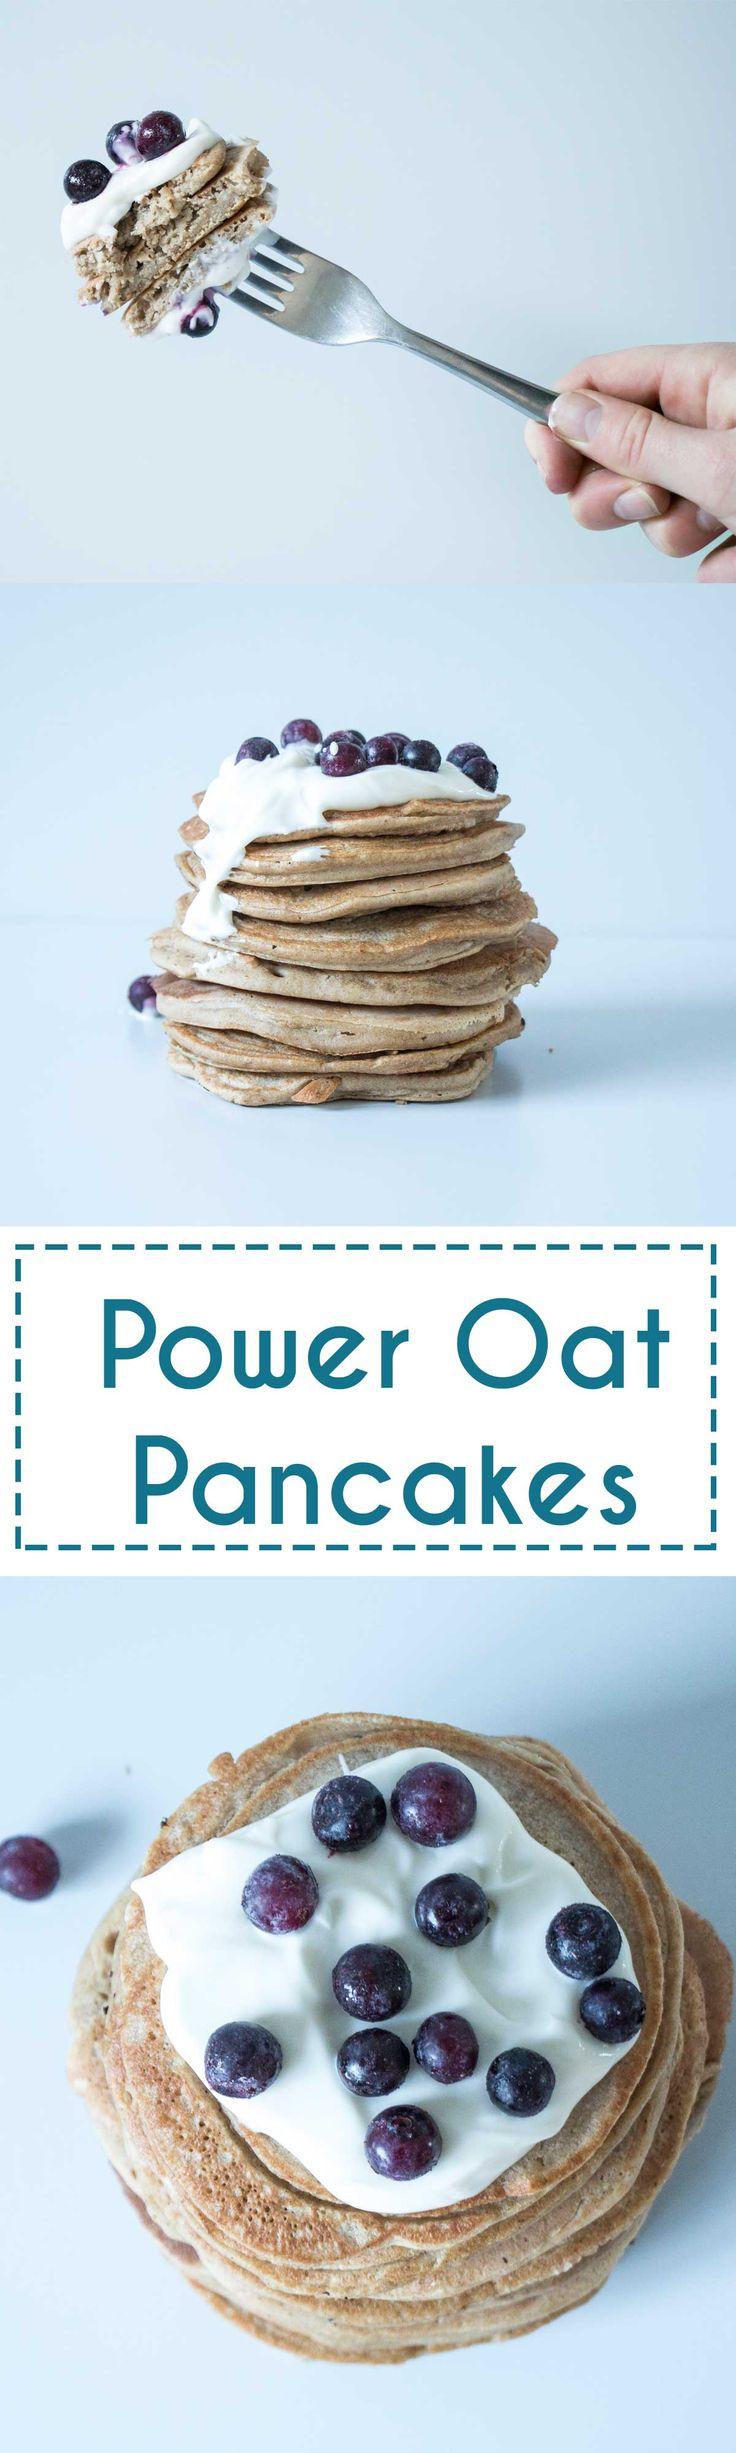 1000+ ideas about Oat Flour Pancakes on Pinterest | Pancakes, Gluten ...